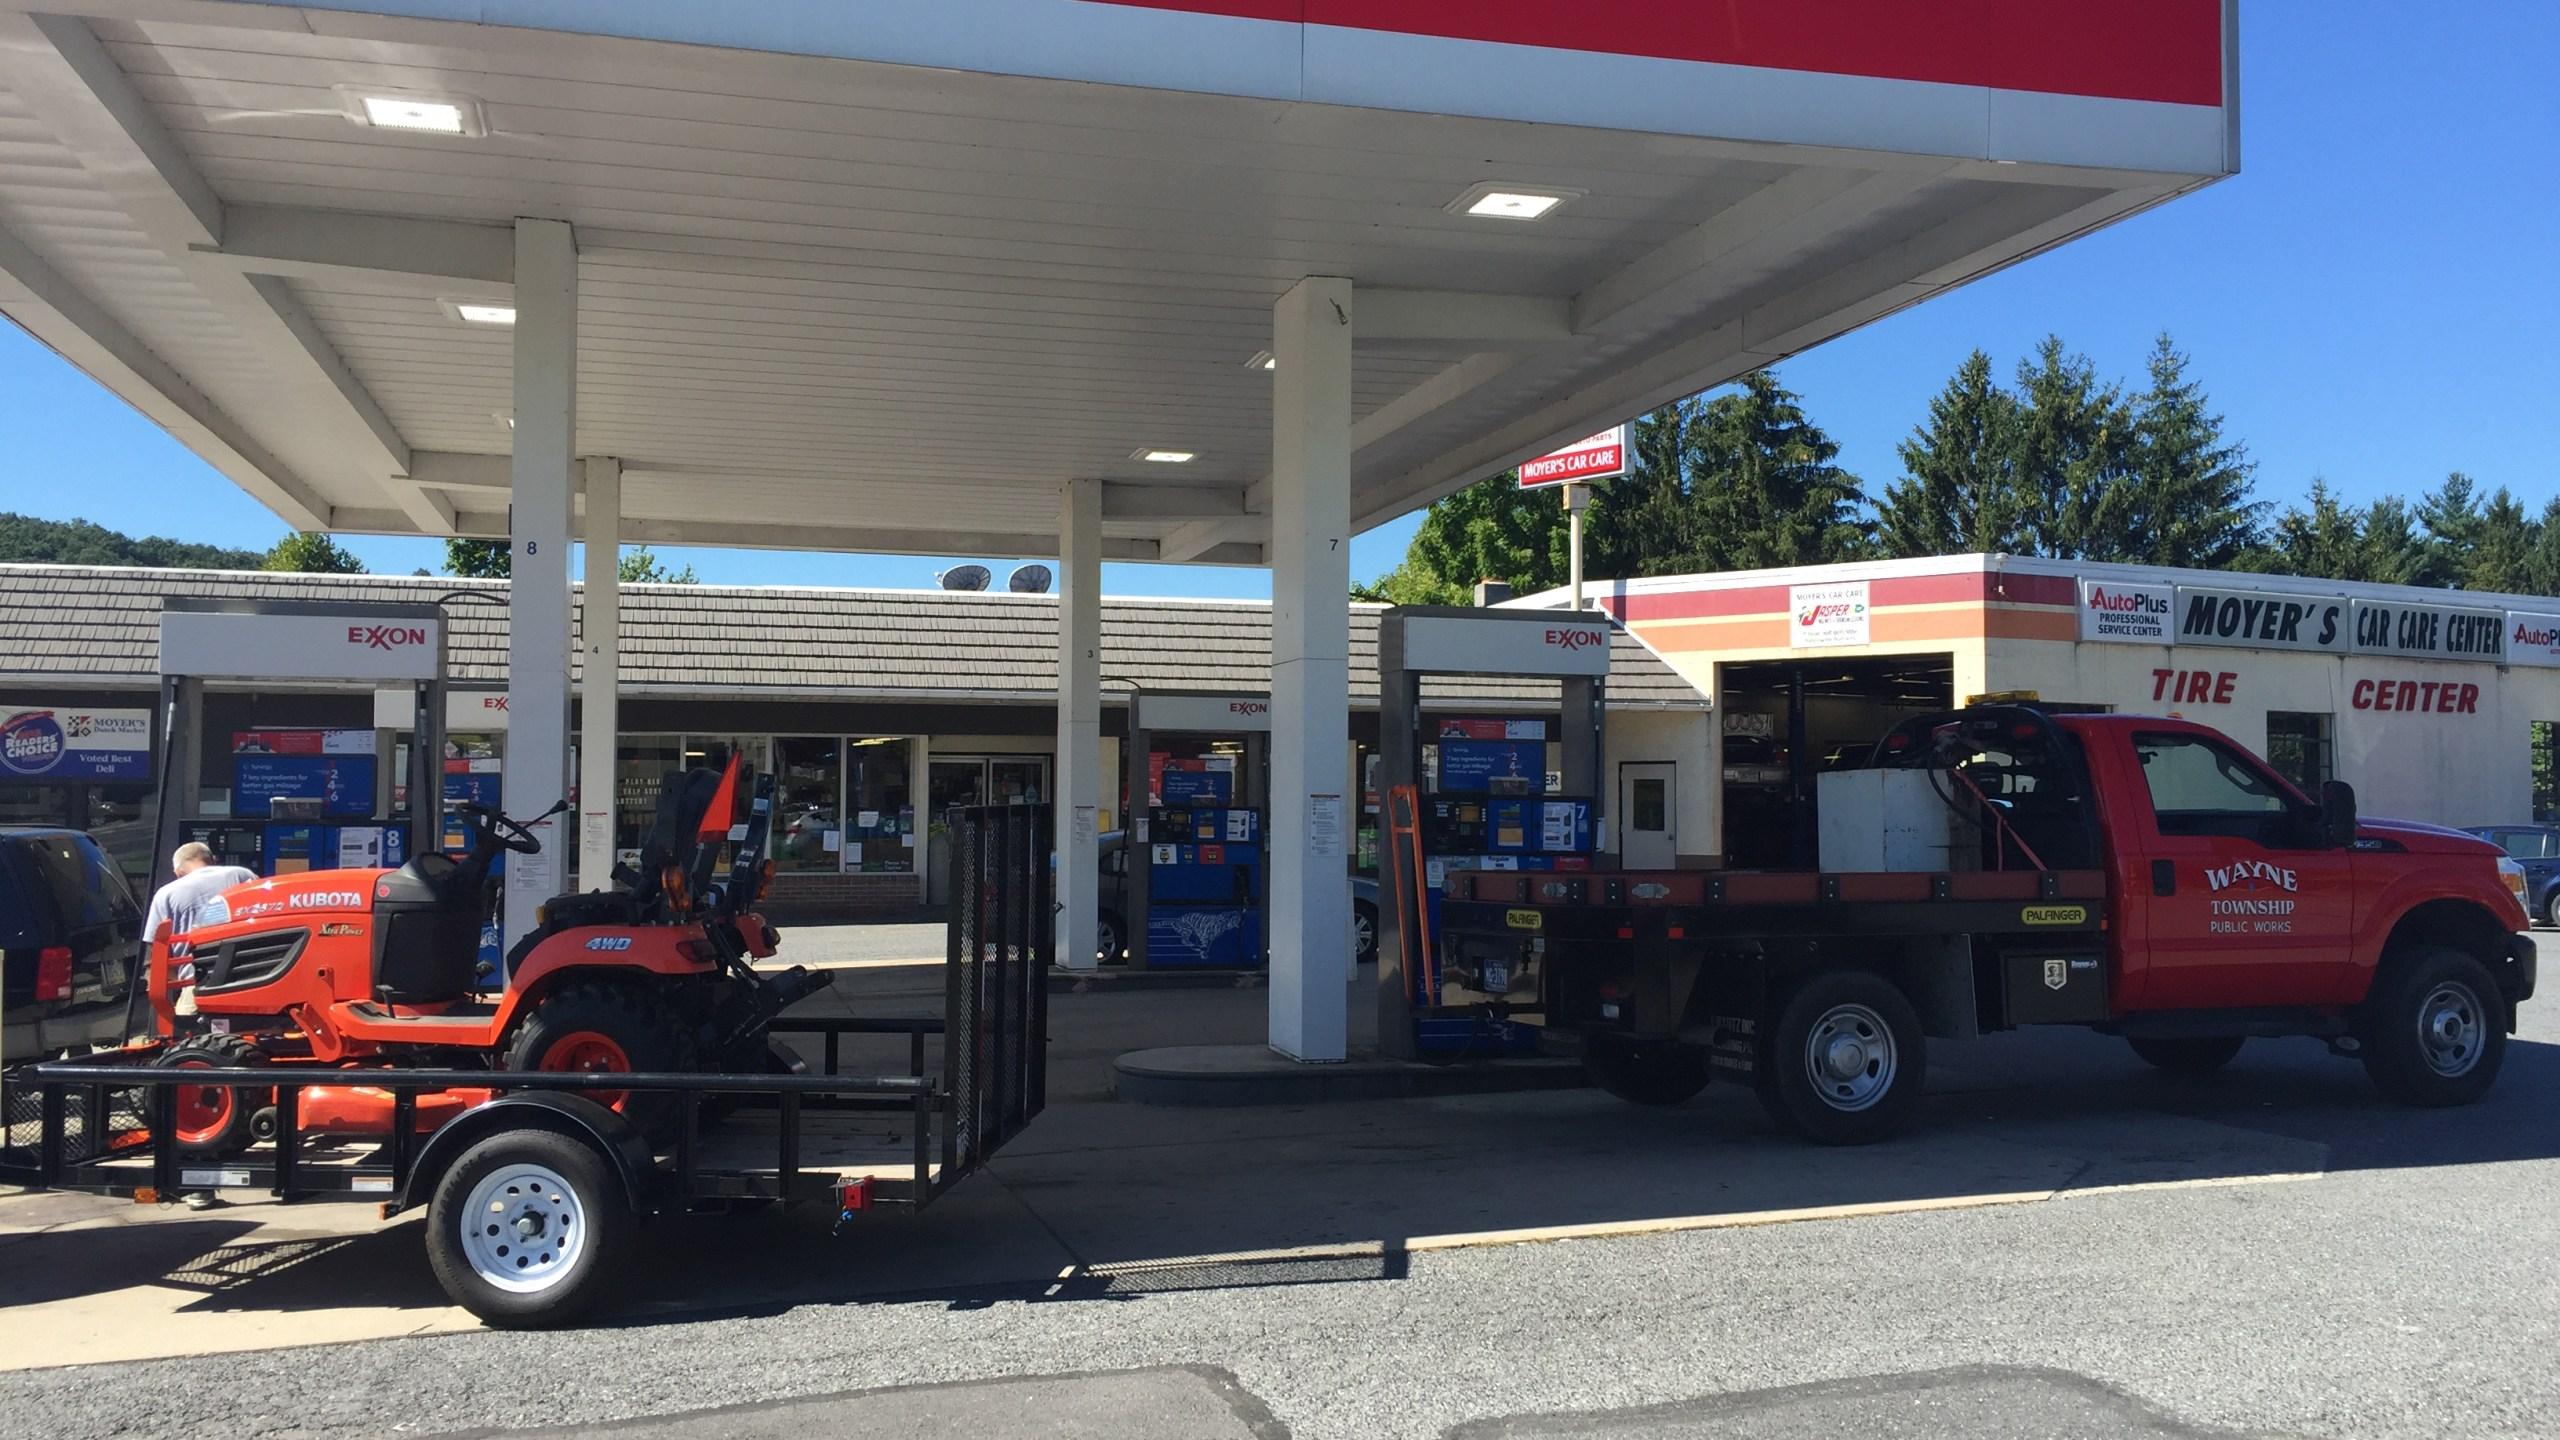 Gas Station_1471963902087.jpg